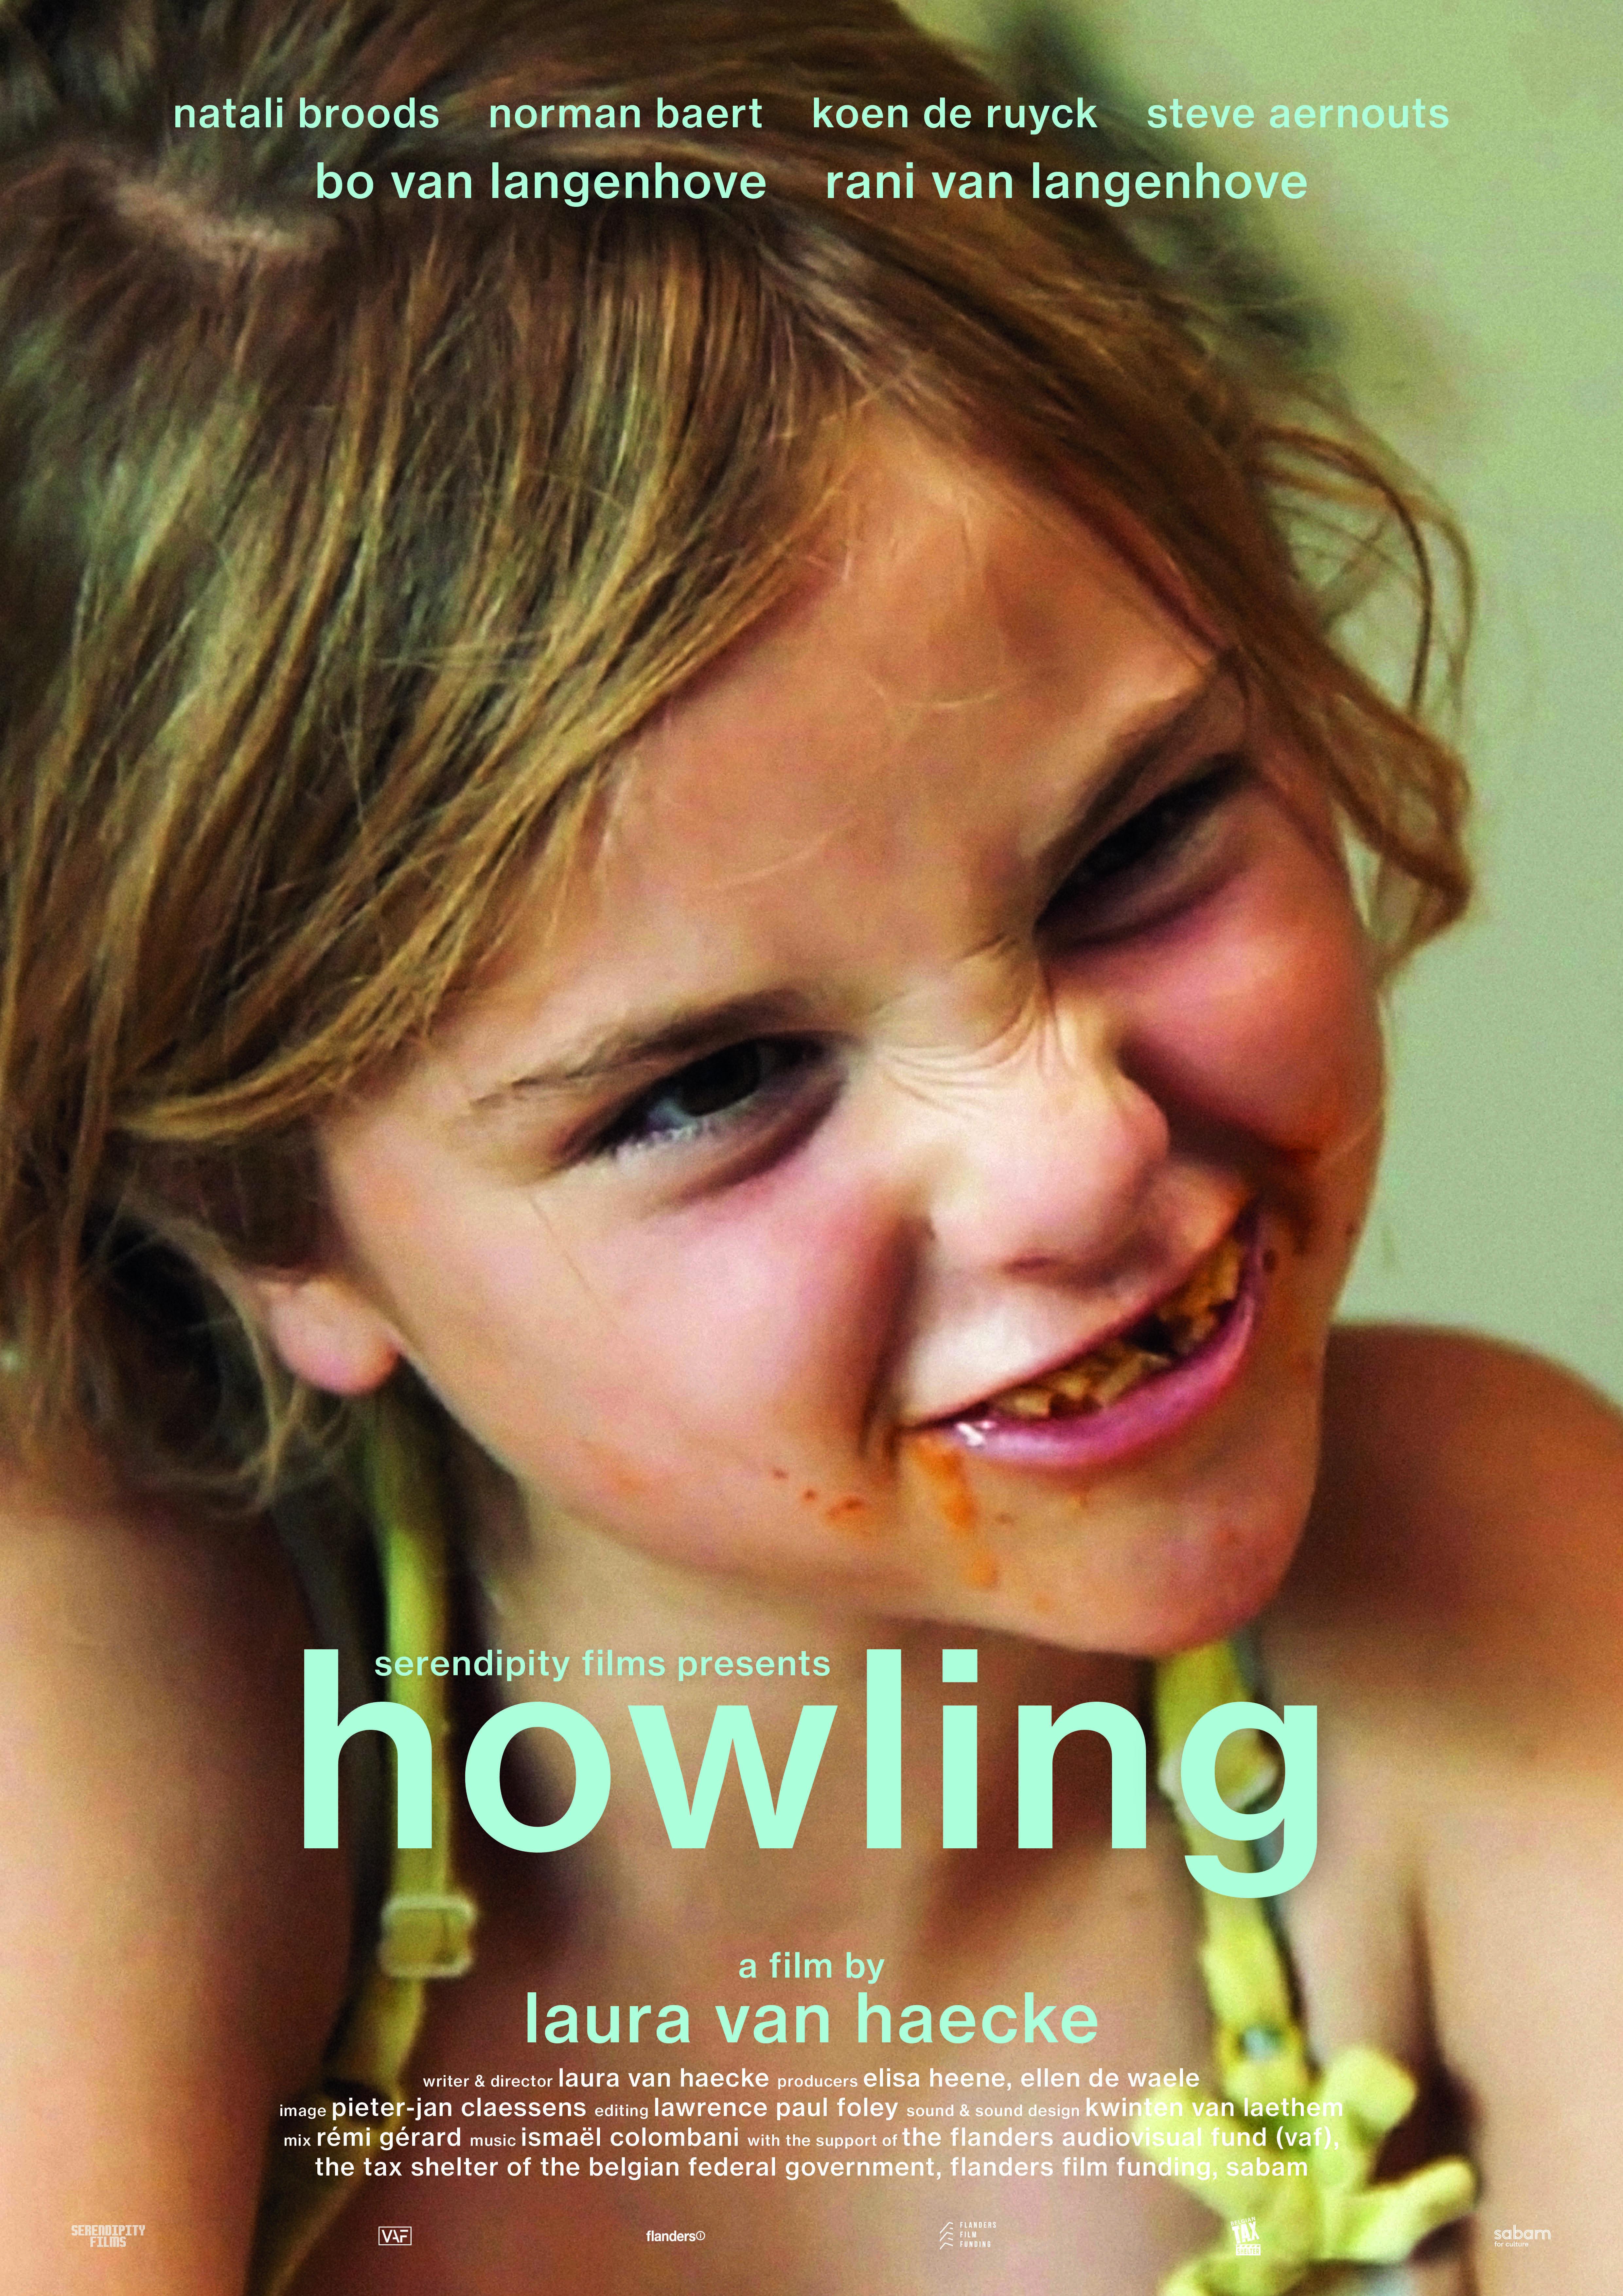 Howling_©studiodaoudijpg